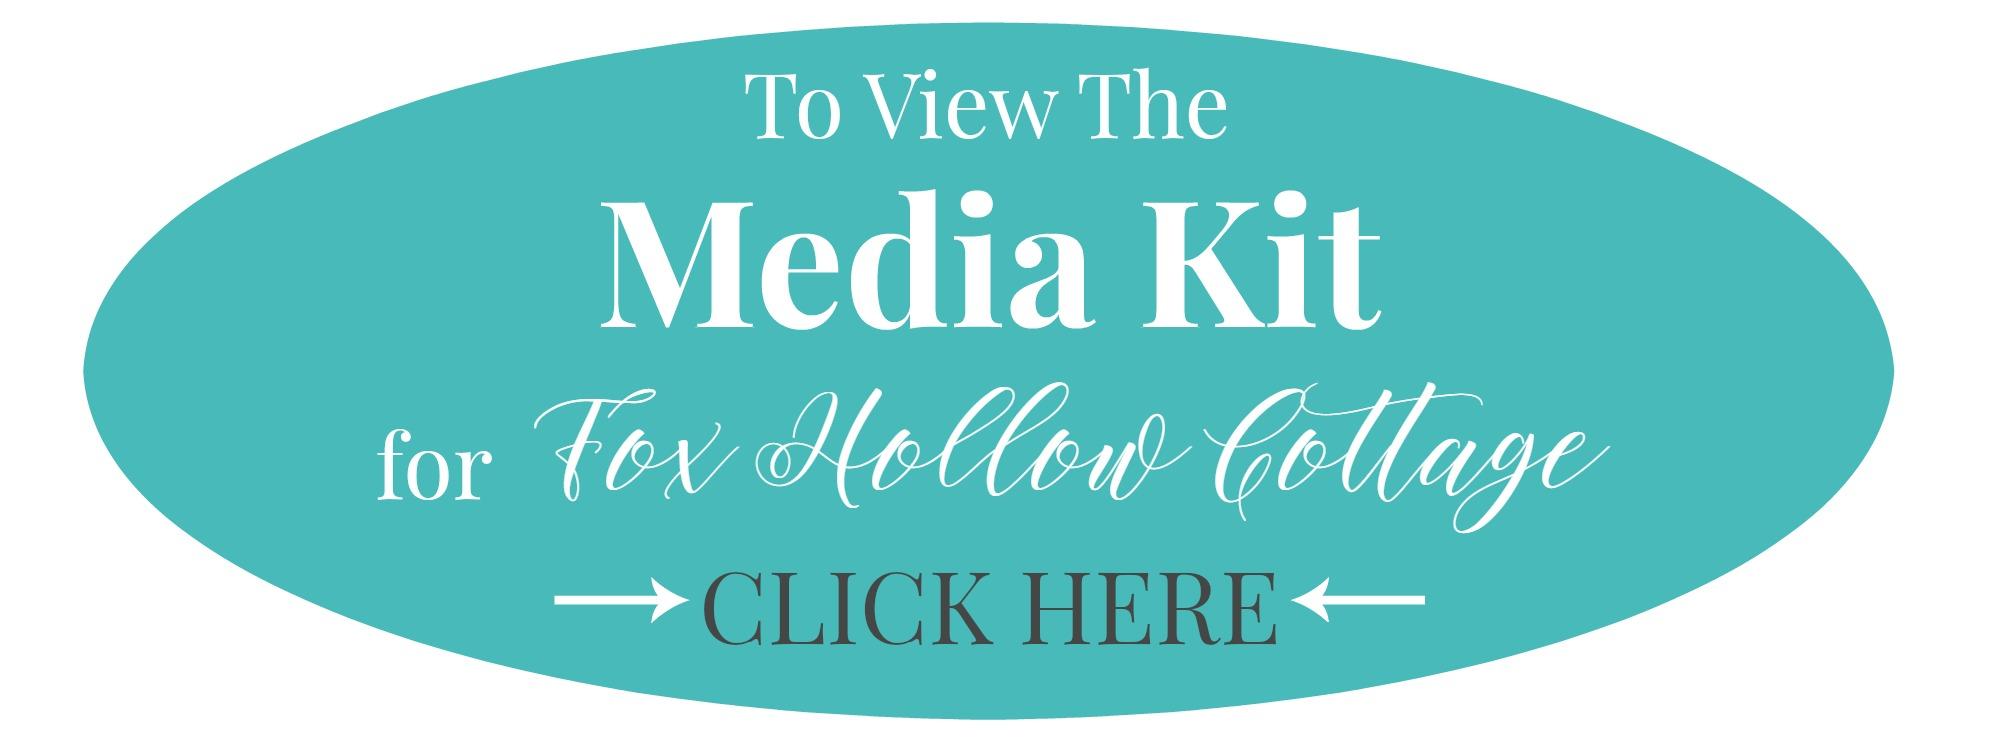 Fox Hollow Cottage Media Kit